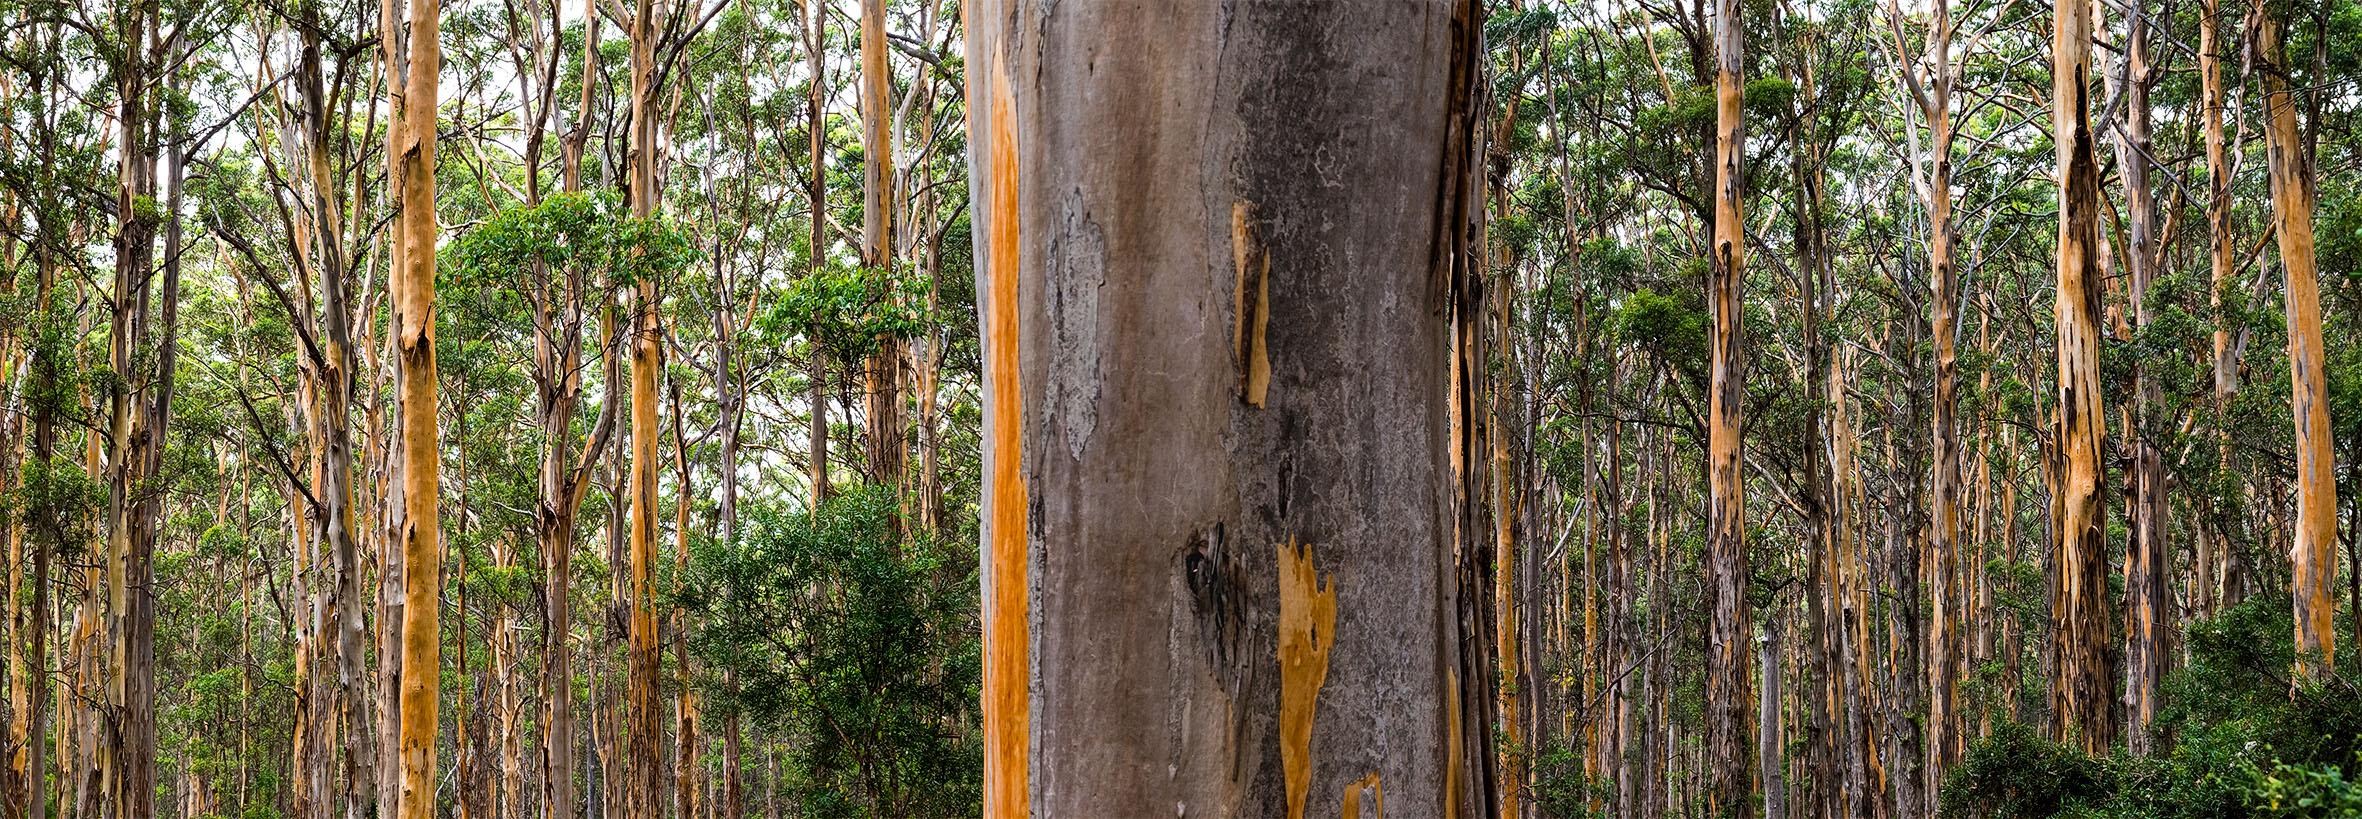 20 Boranup Karri Forest #1. WA. 2018